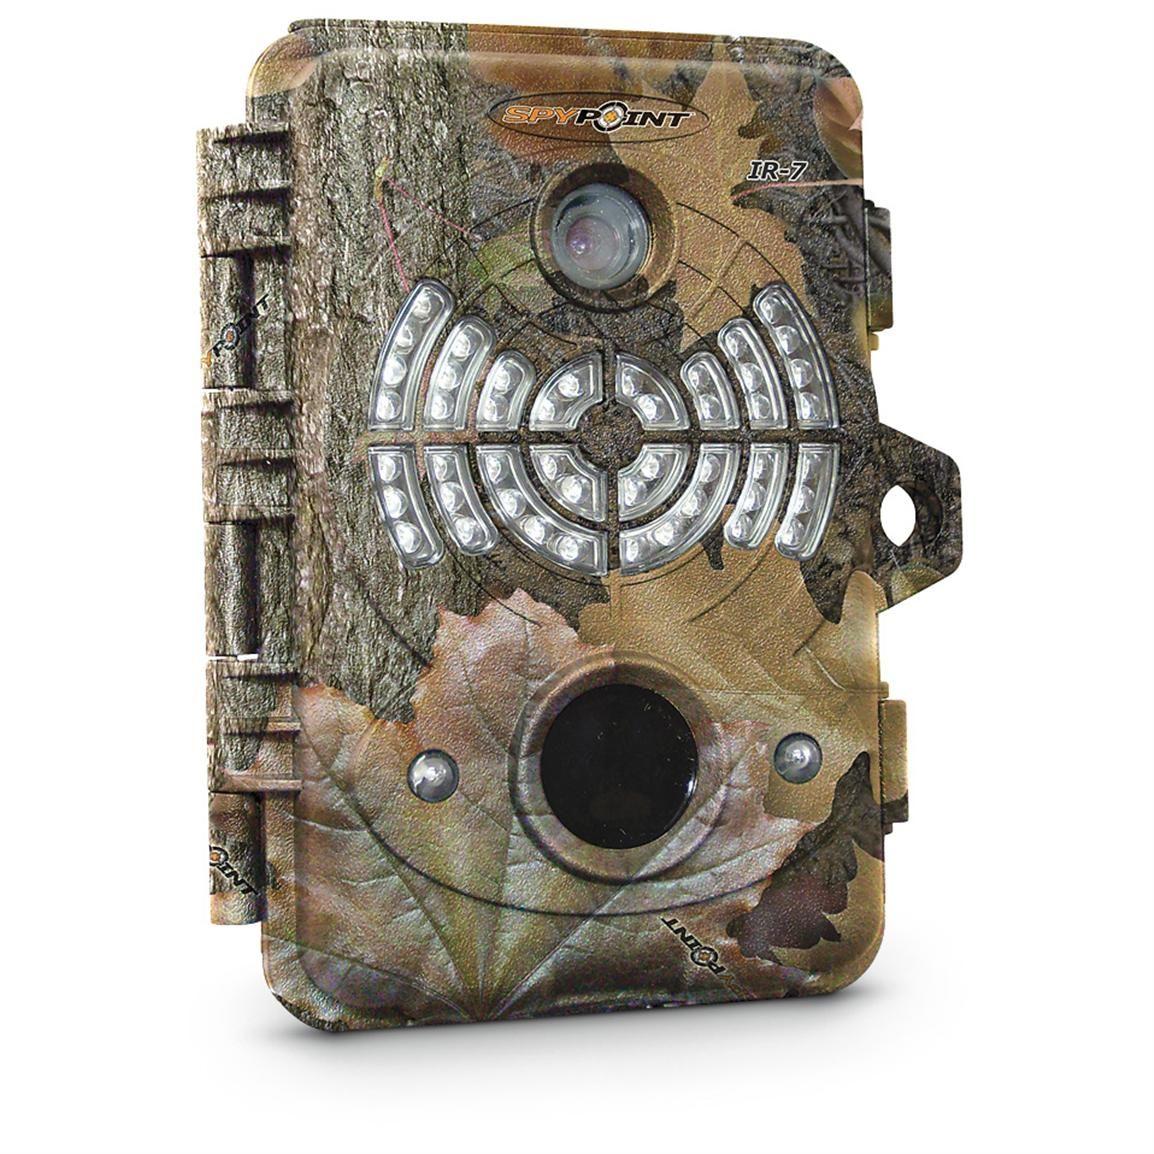 SpyPoint™ IR 7 Infrared Game Camera tracks trophy racks